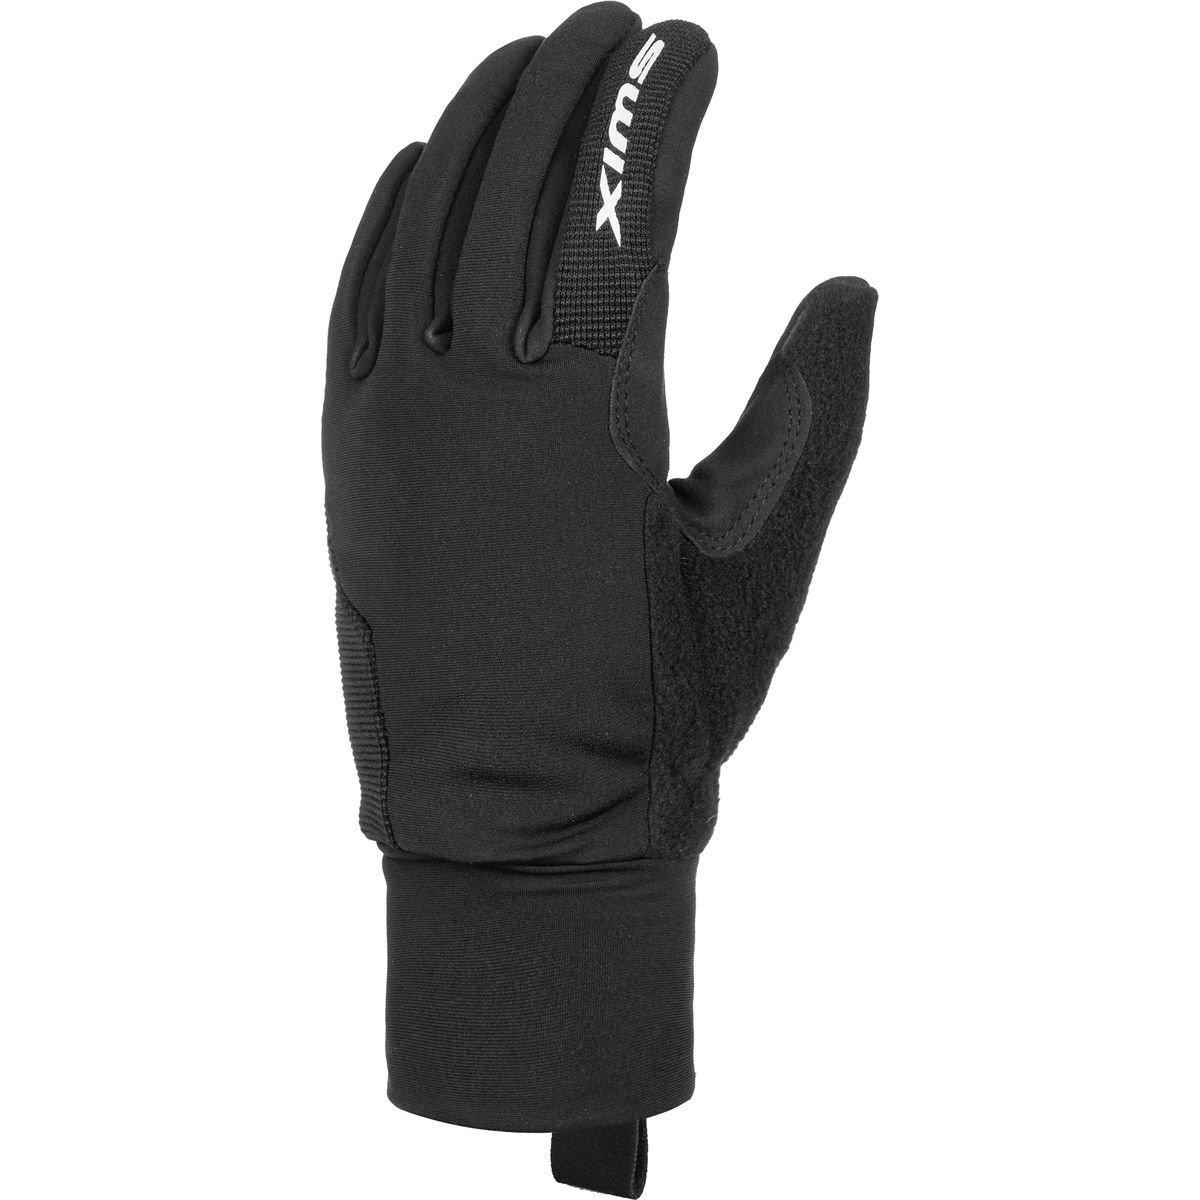 Swix Lynx Glove - Kids' XL H0792-10000-XL